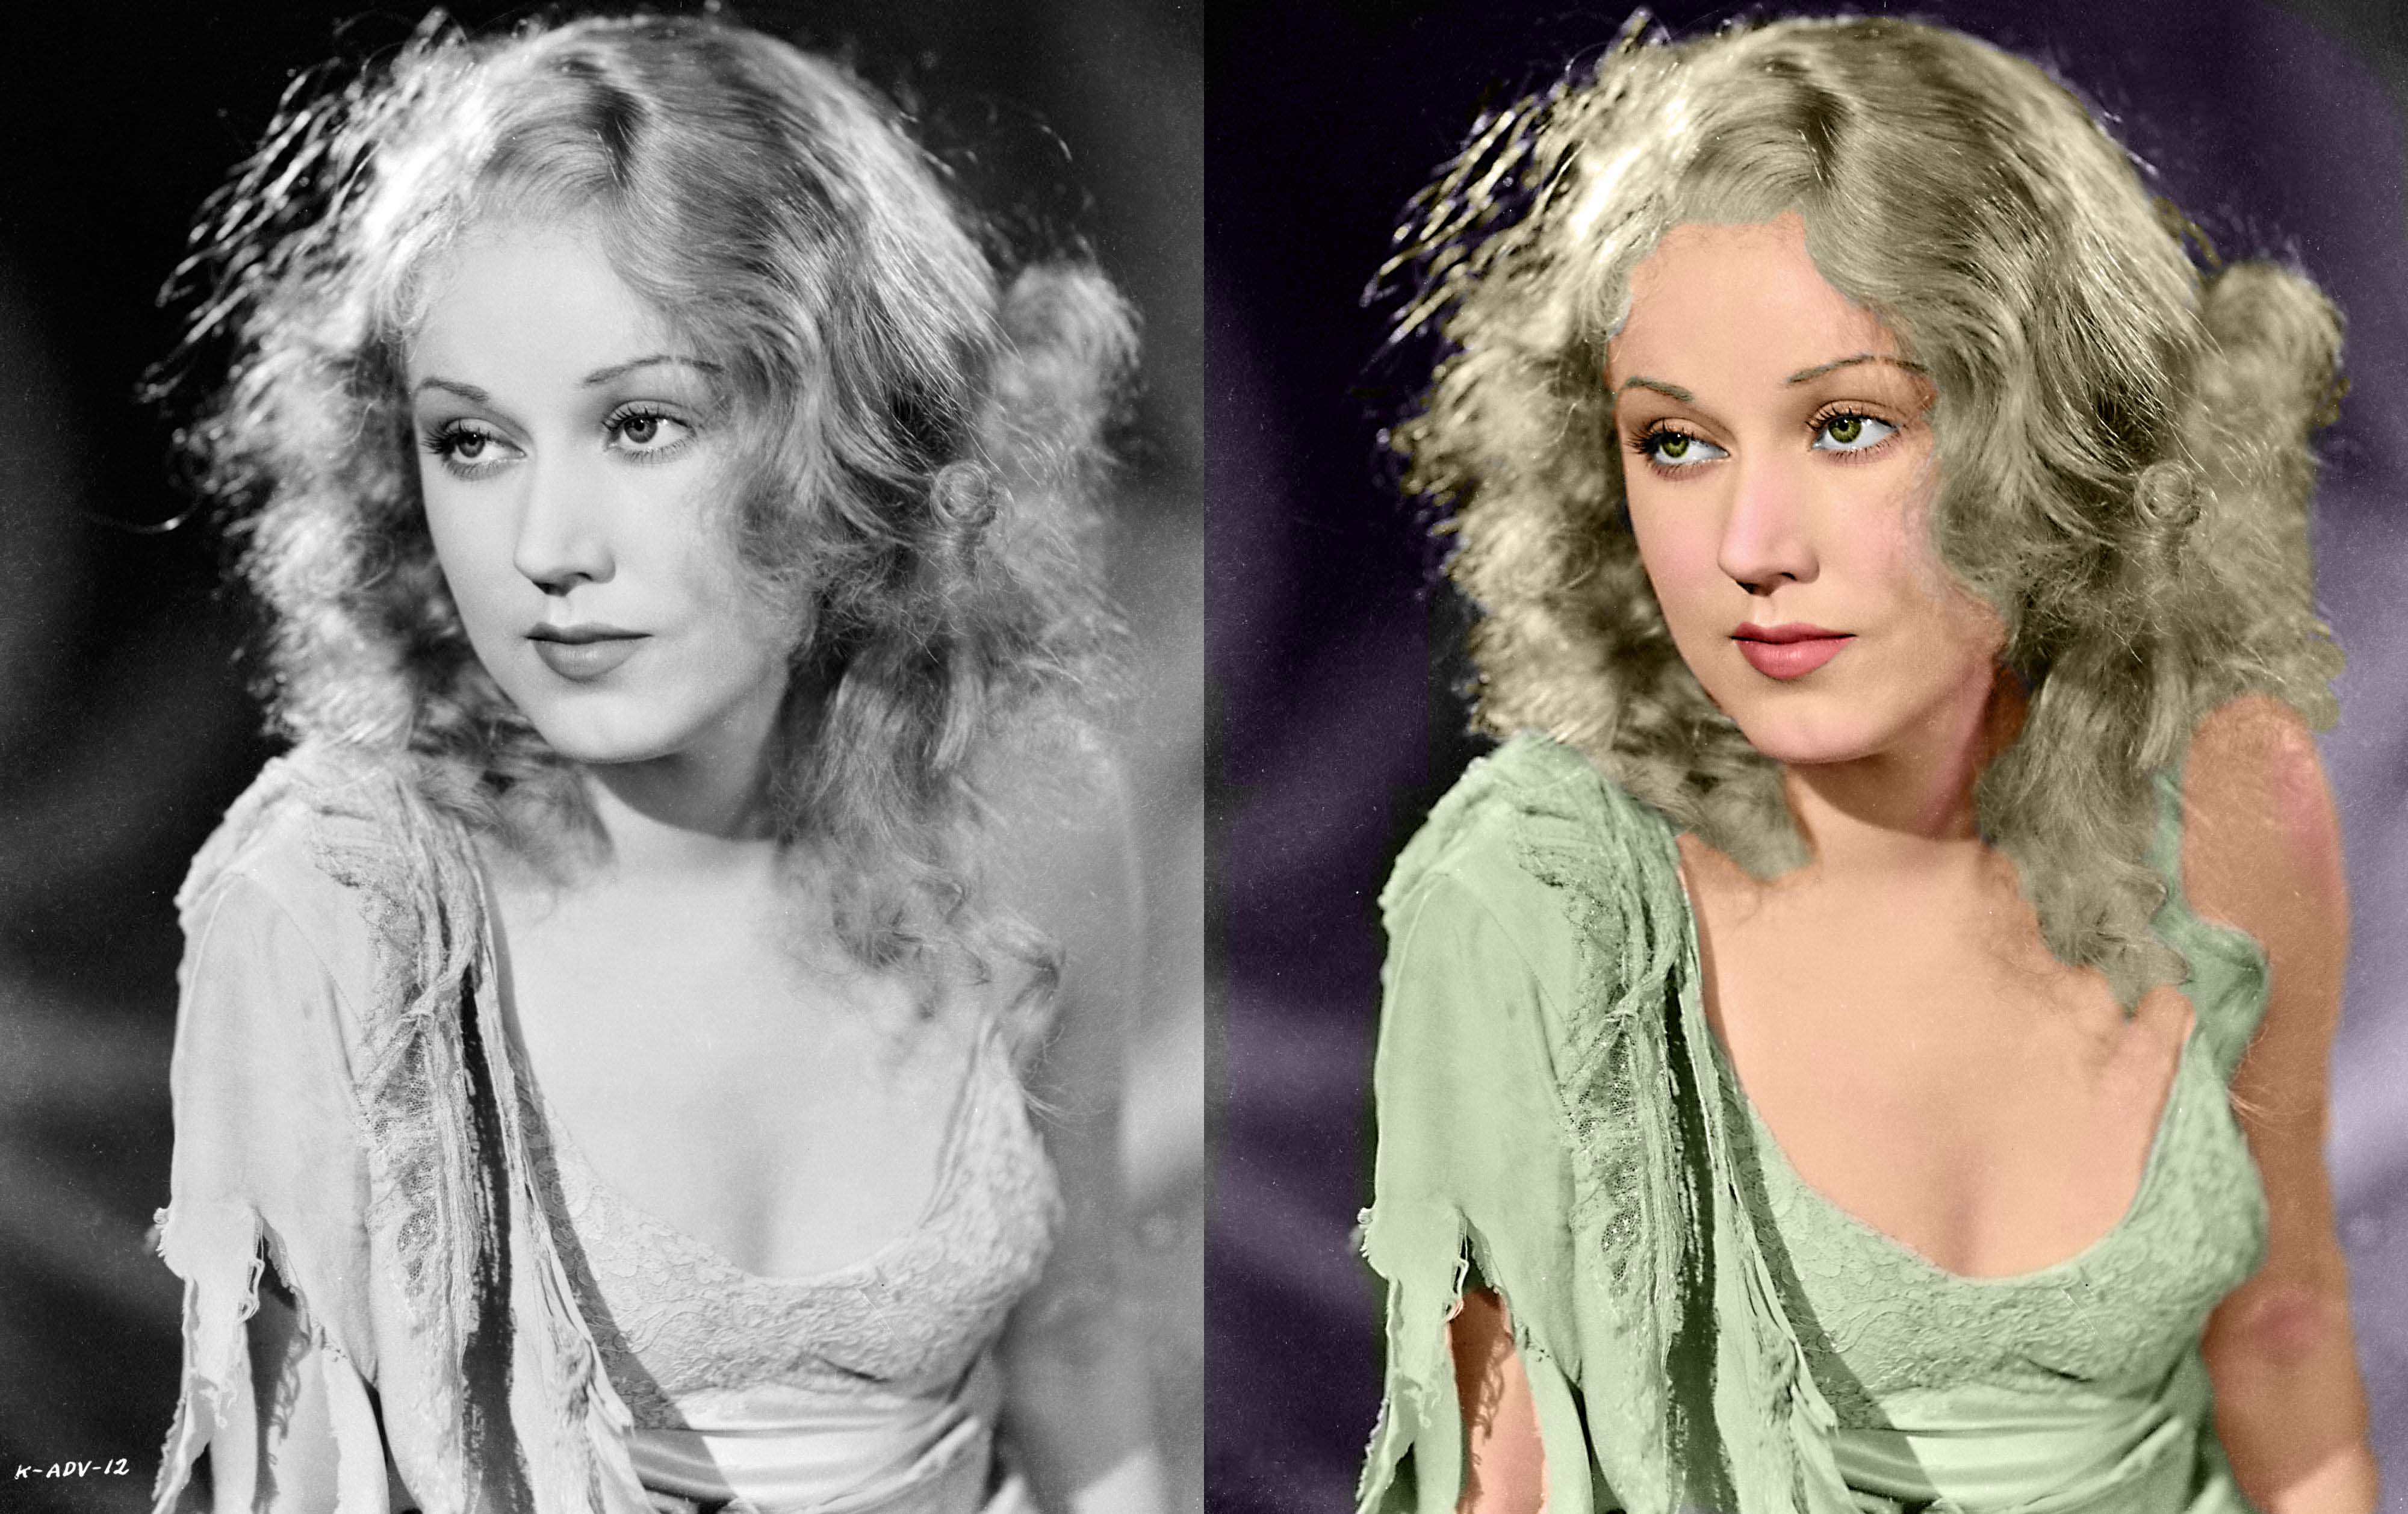 Actress Fay Wray (1907-2004) : Colorization